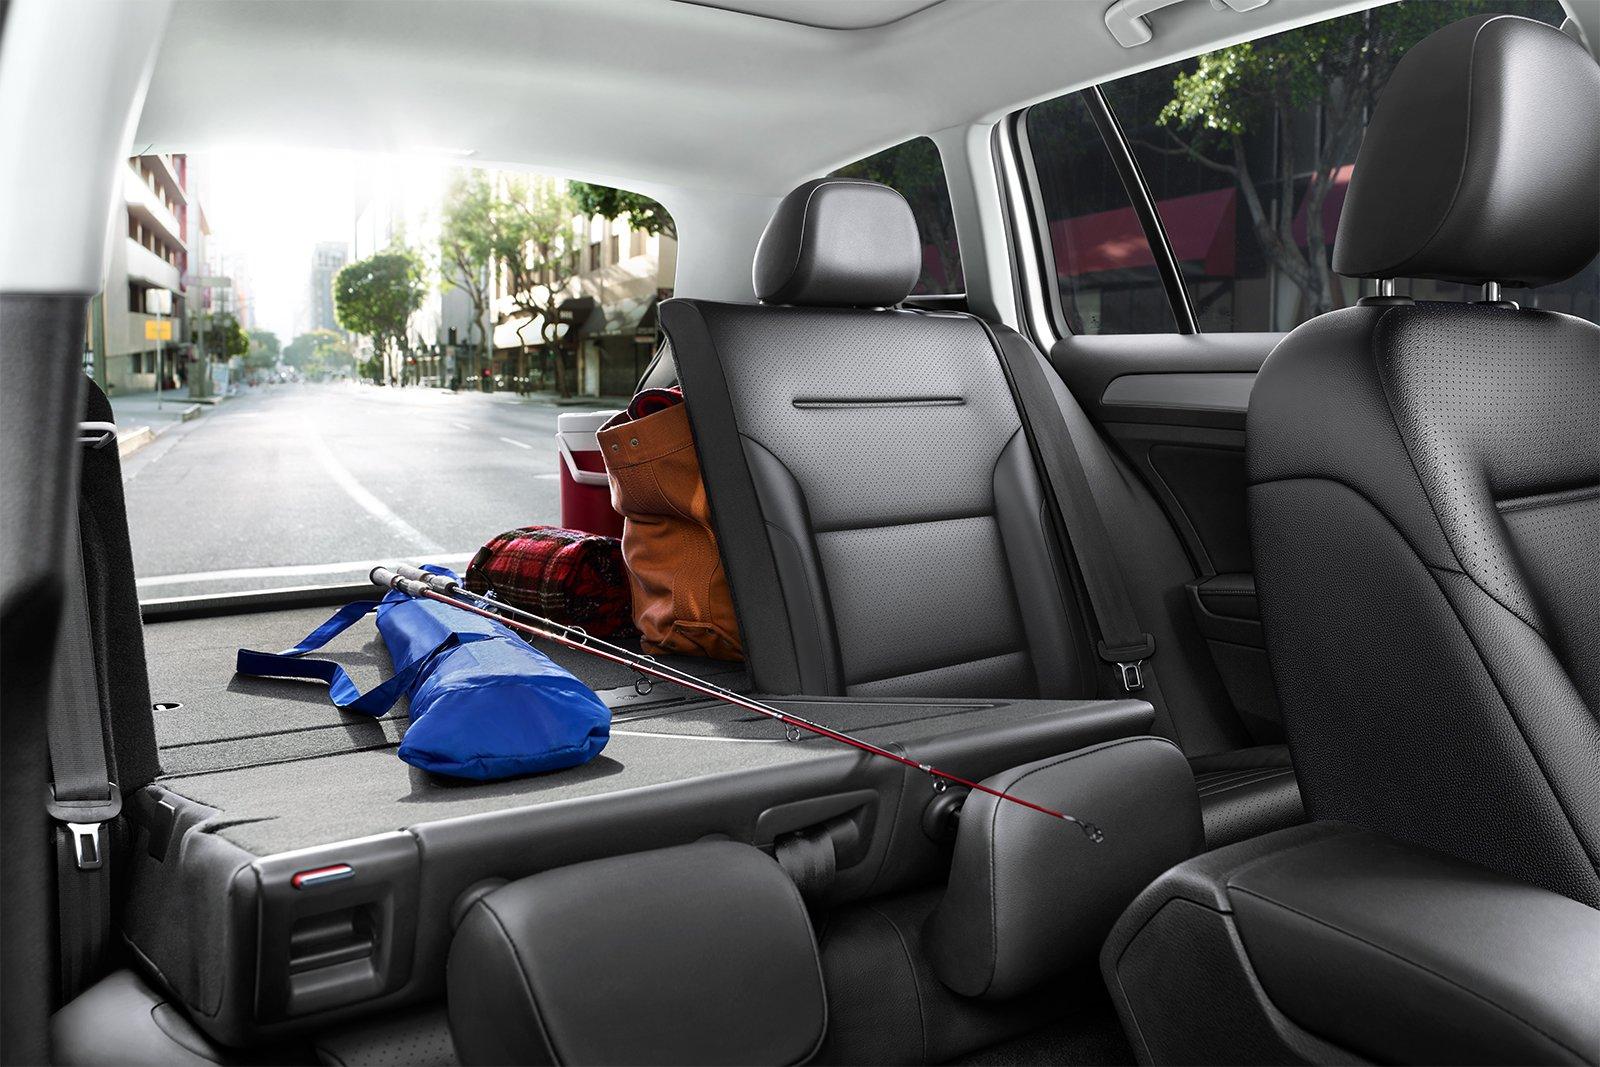 New VW Golf SportWagen Lease Deals & Finance Offers